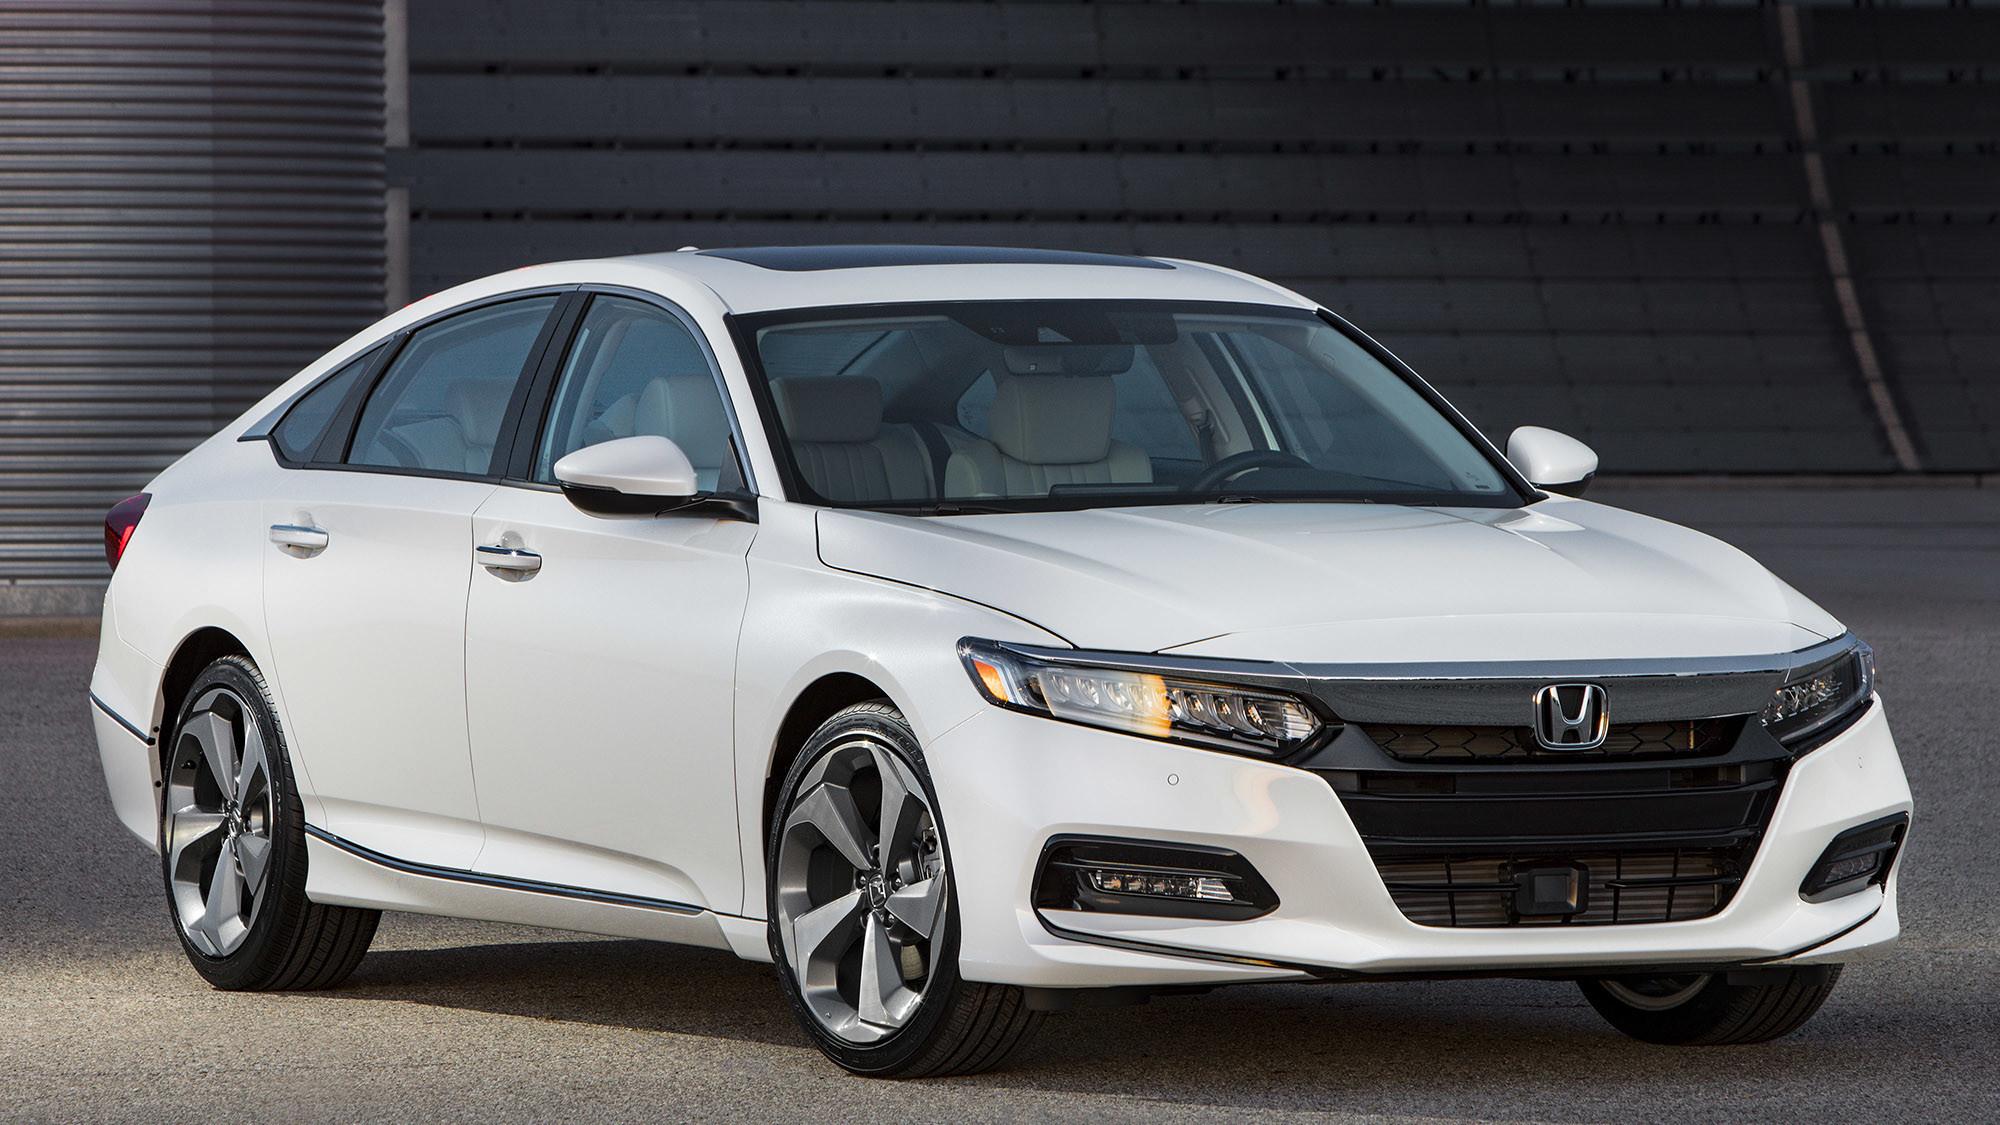 Honda sports up its sedan line with the 2018 Accord